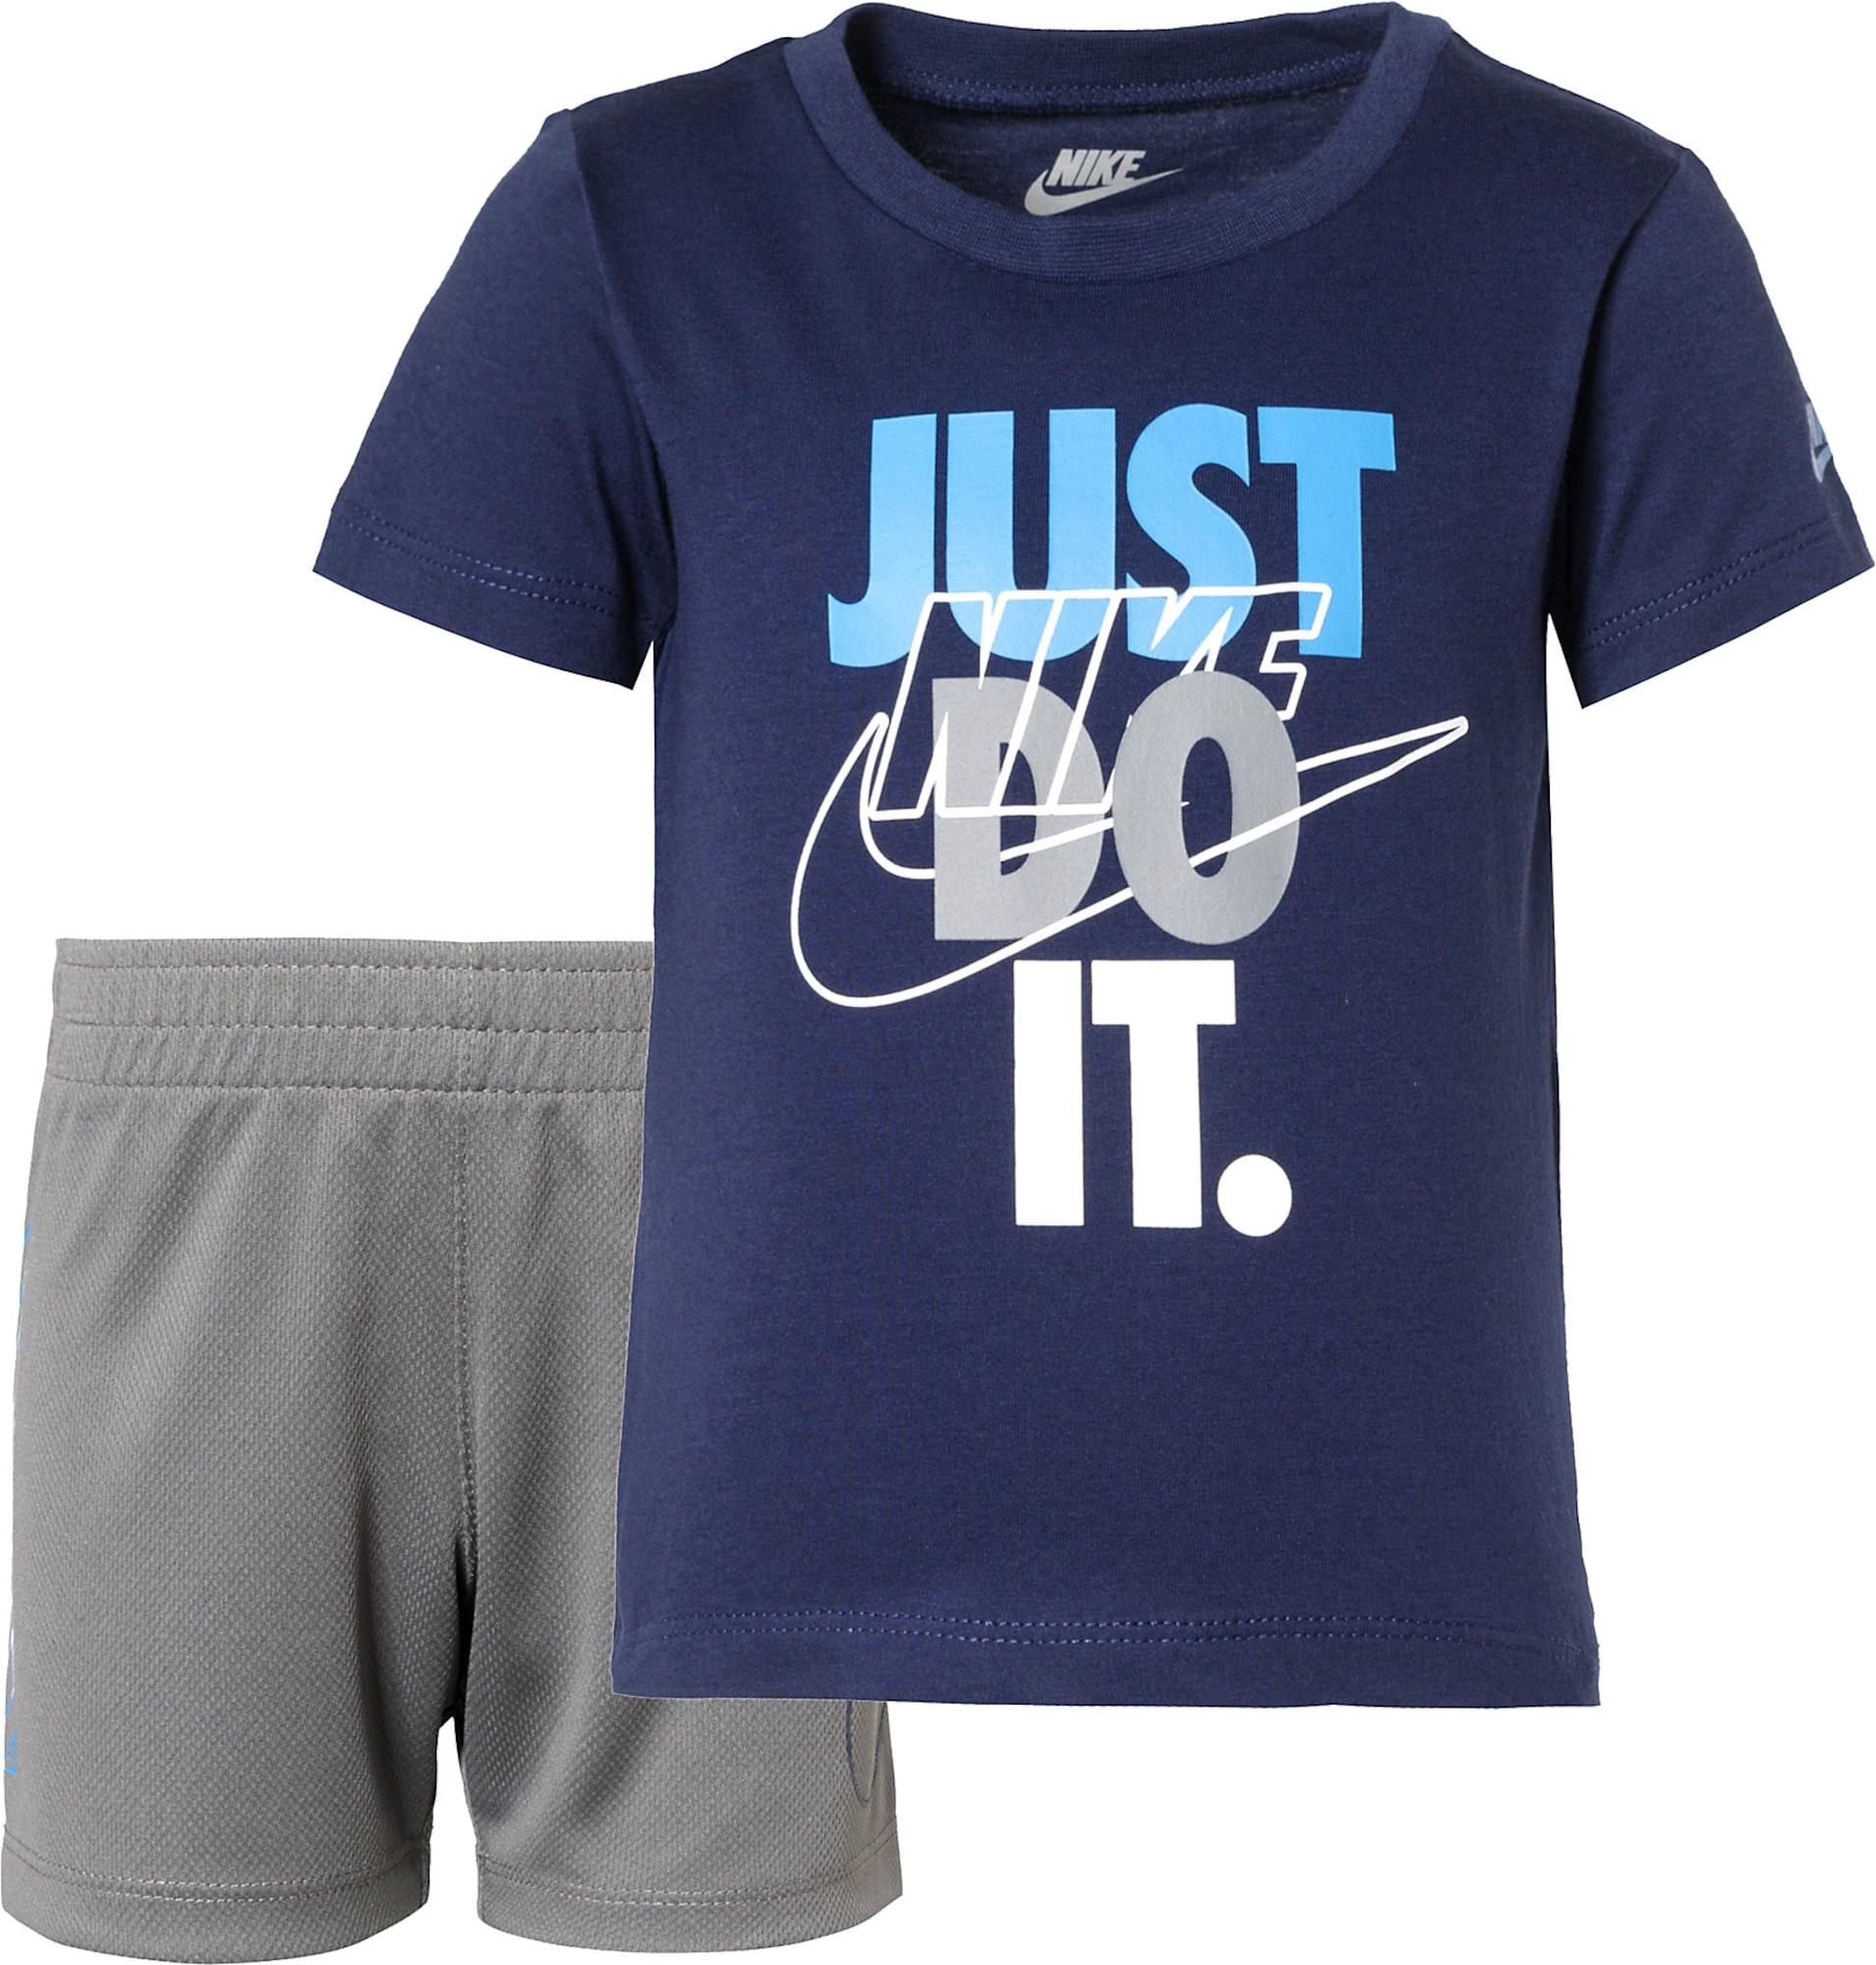 Nike Sportswear Treningas mėlyna / balta / turkio spalva / pilka